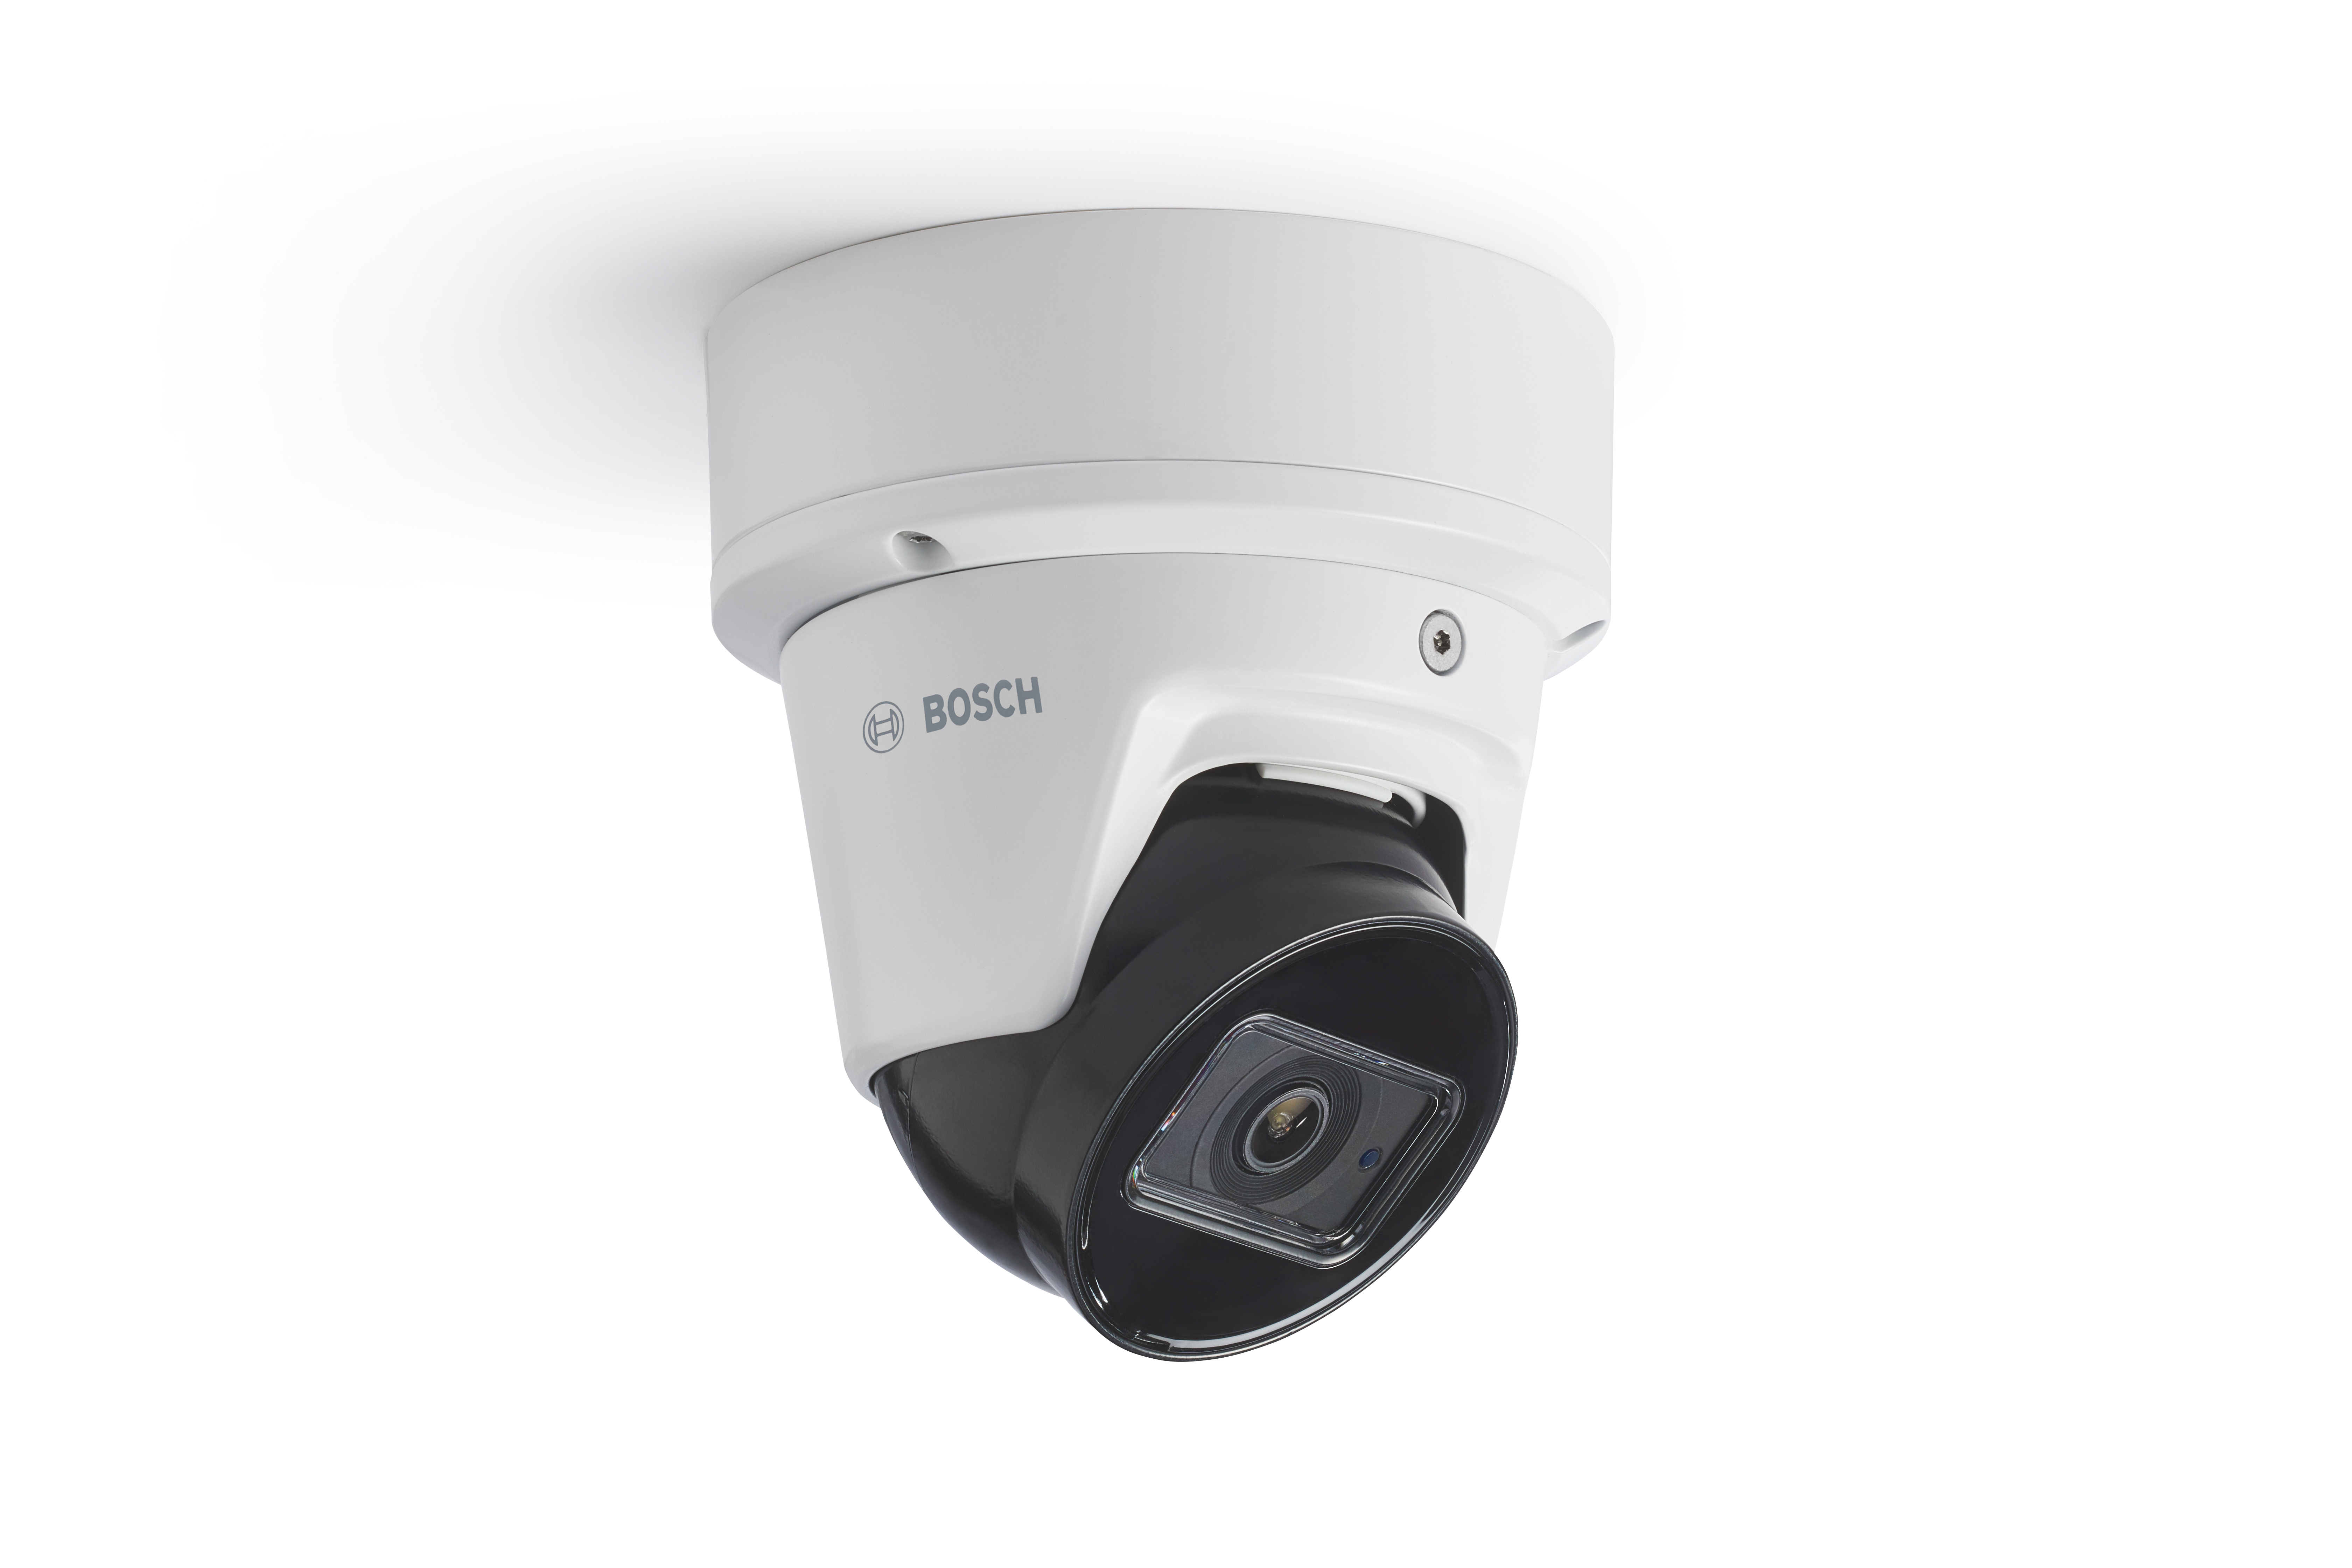 Bosch NTV-3503-F02L